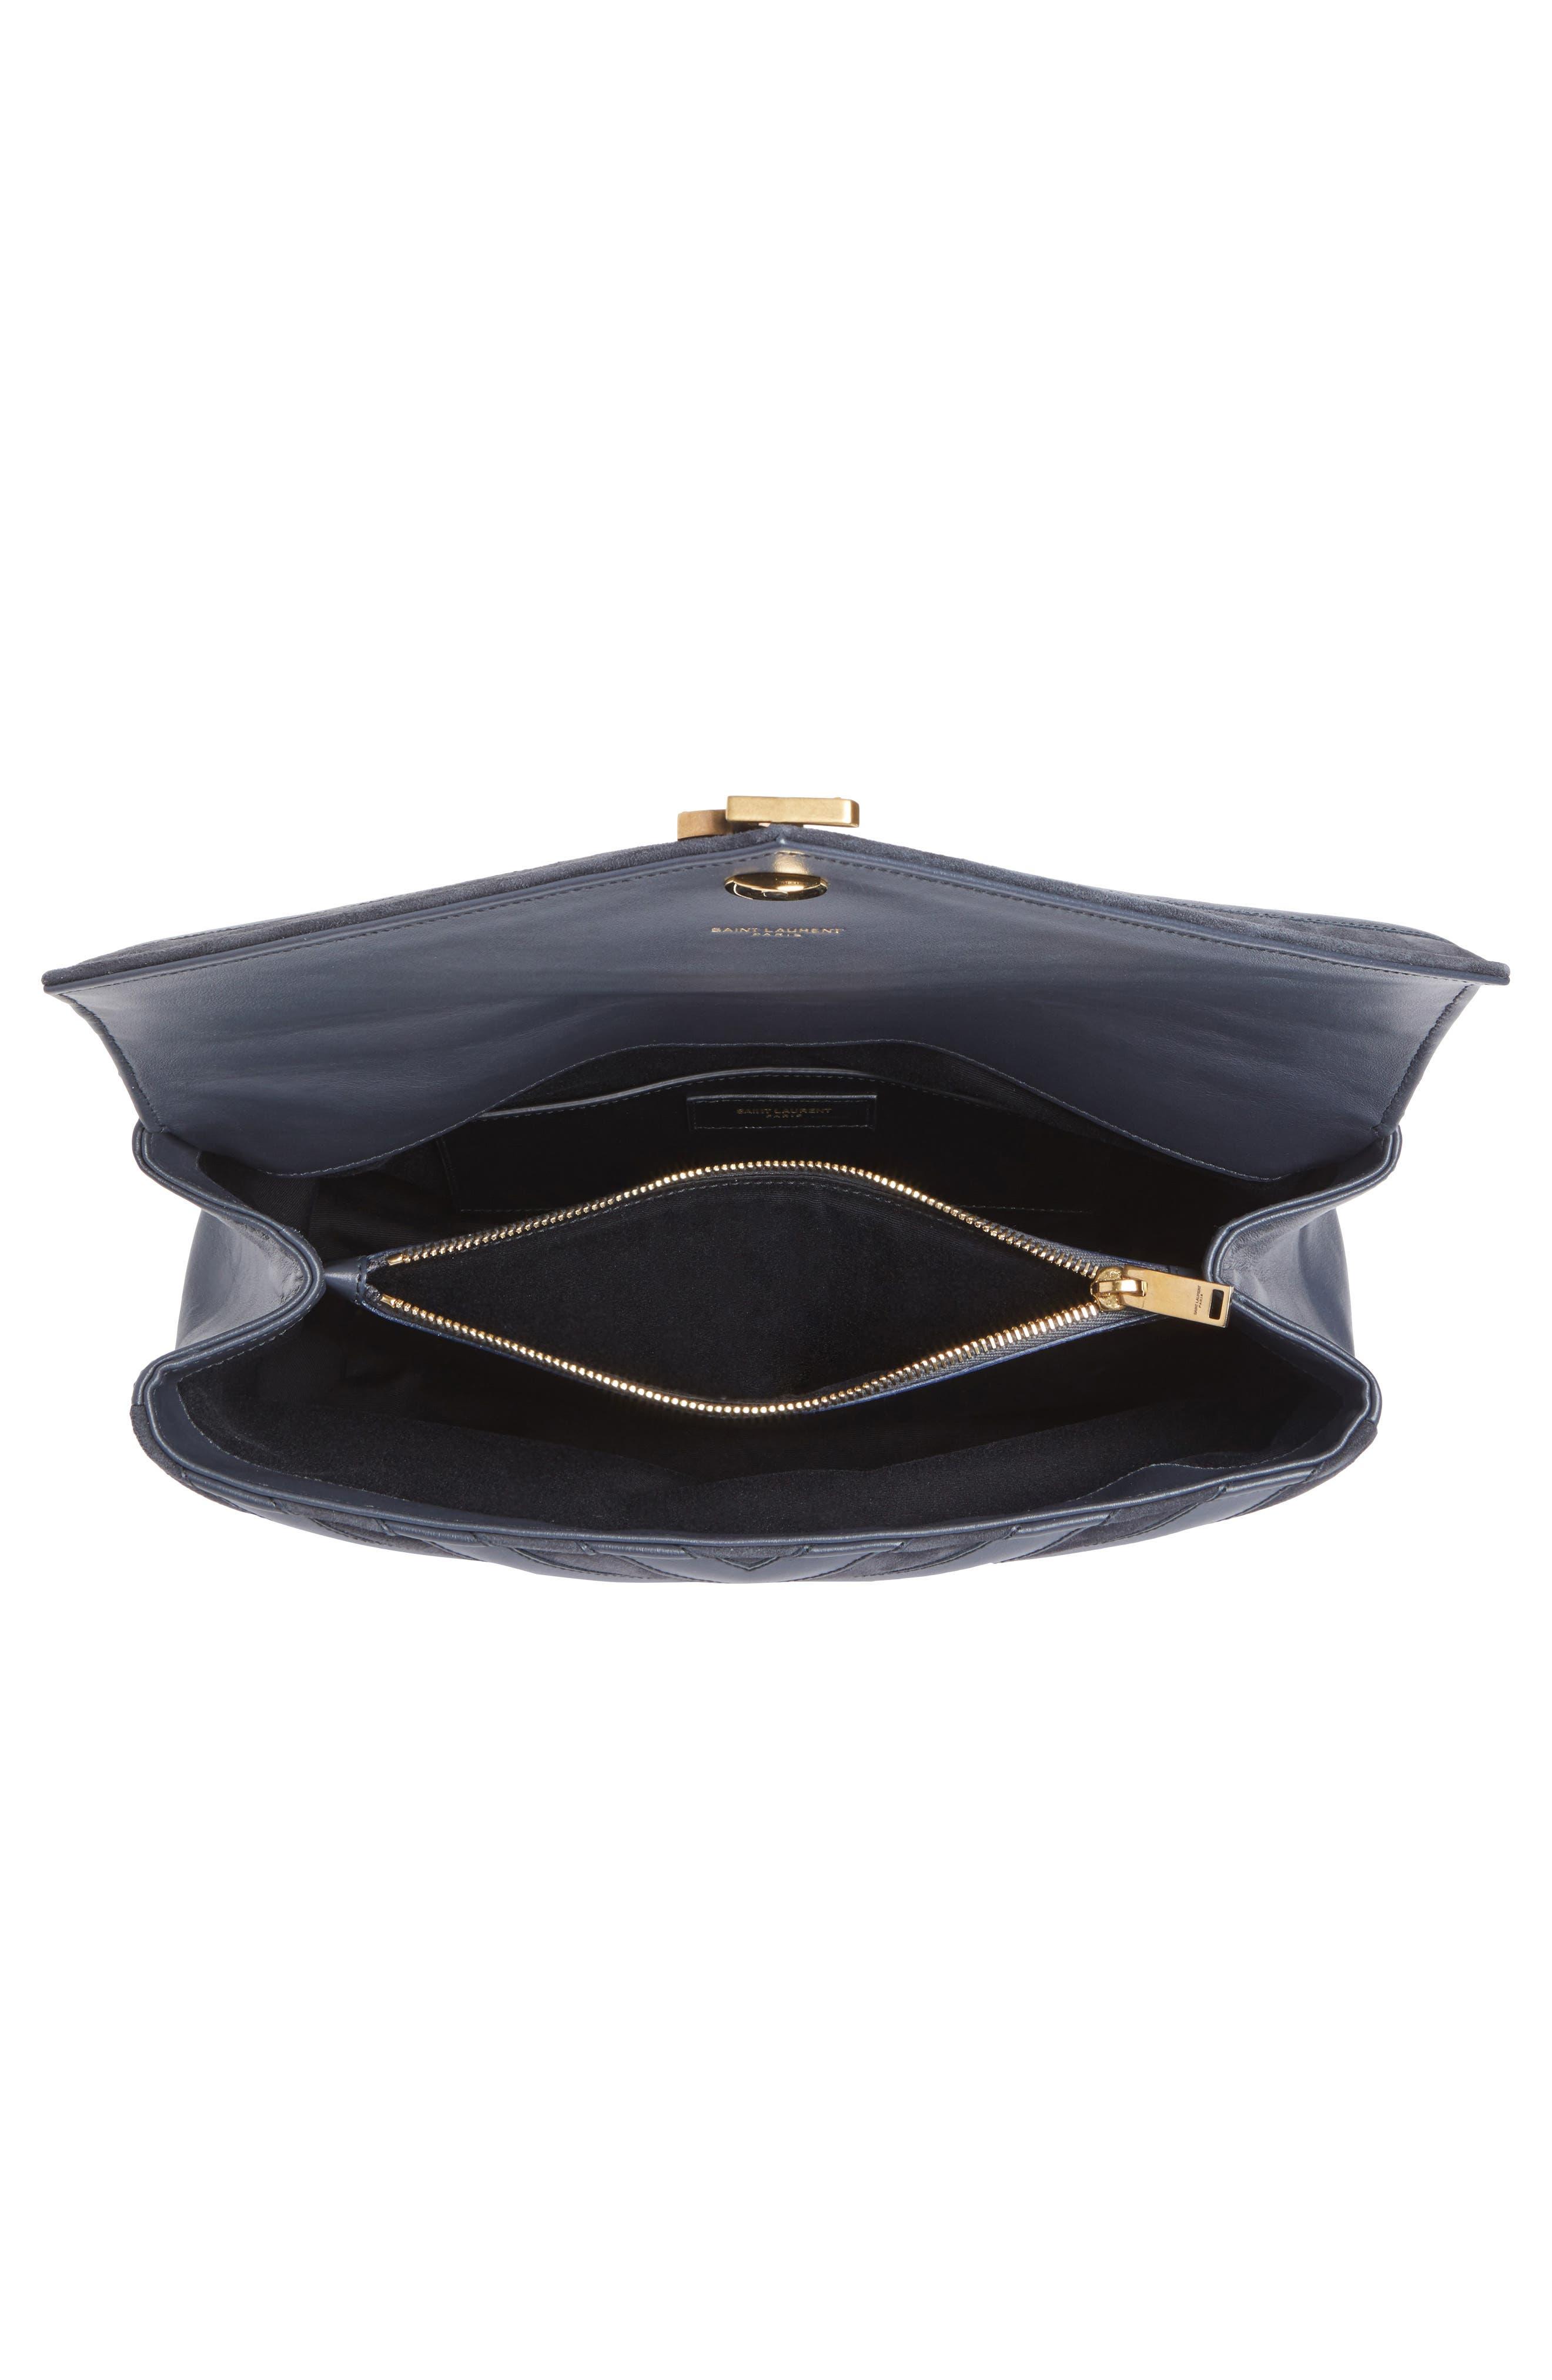 Medium College Patchwork Suede & Leather Shoulder Bag,                             Alternate thumbnail 4, color,                             Graphite